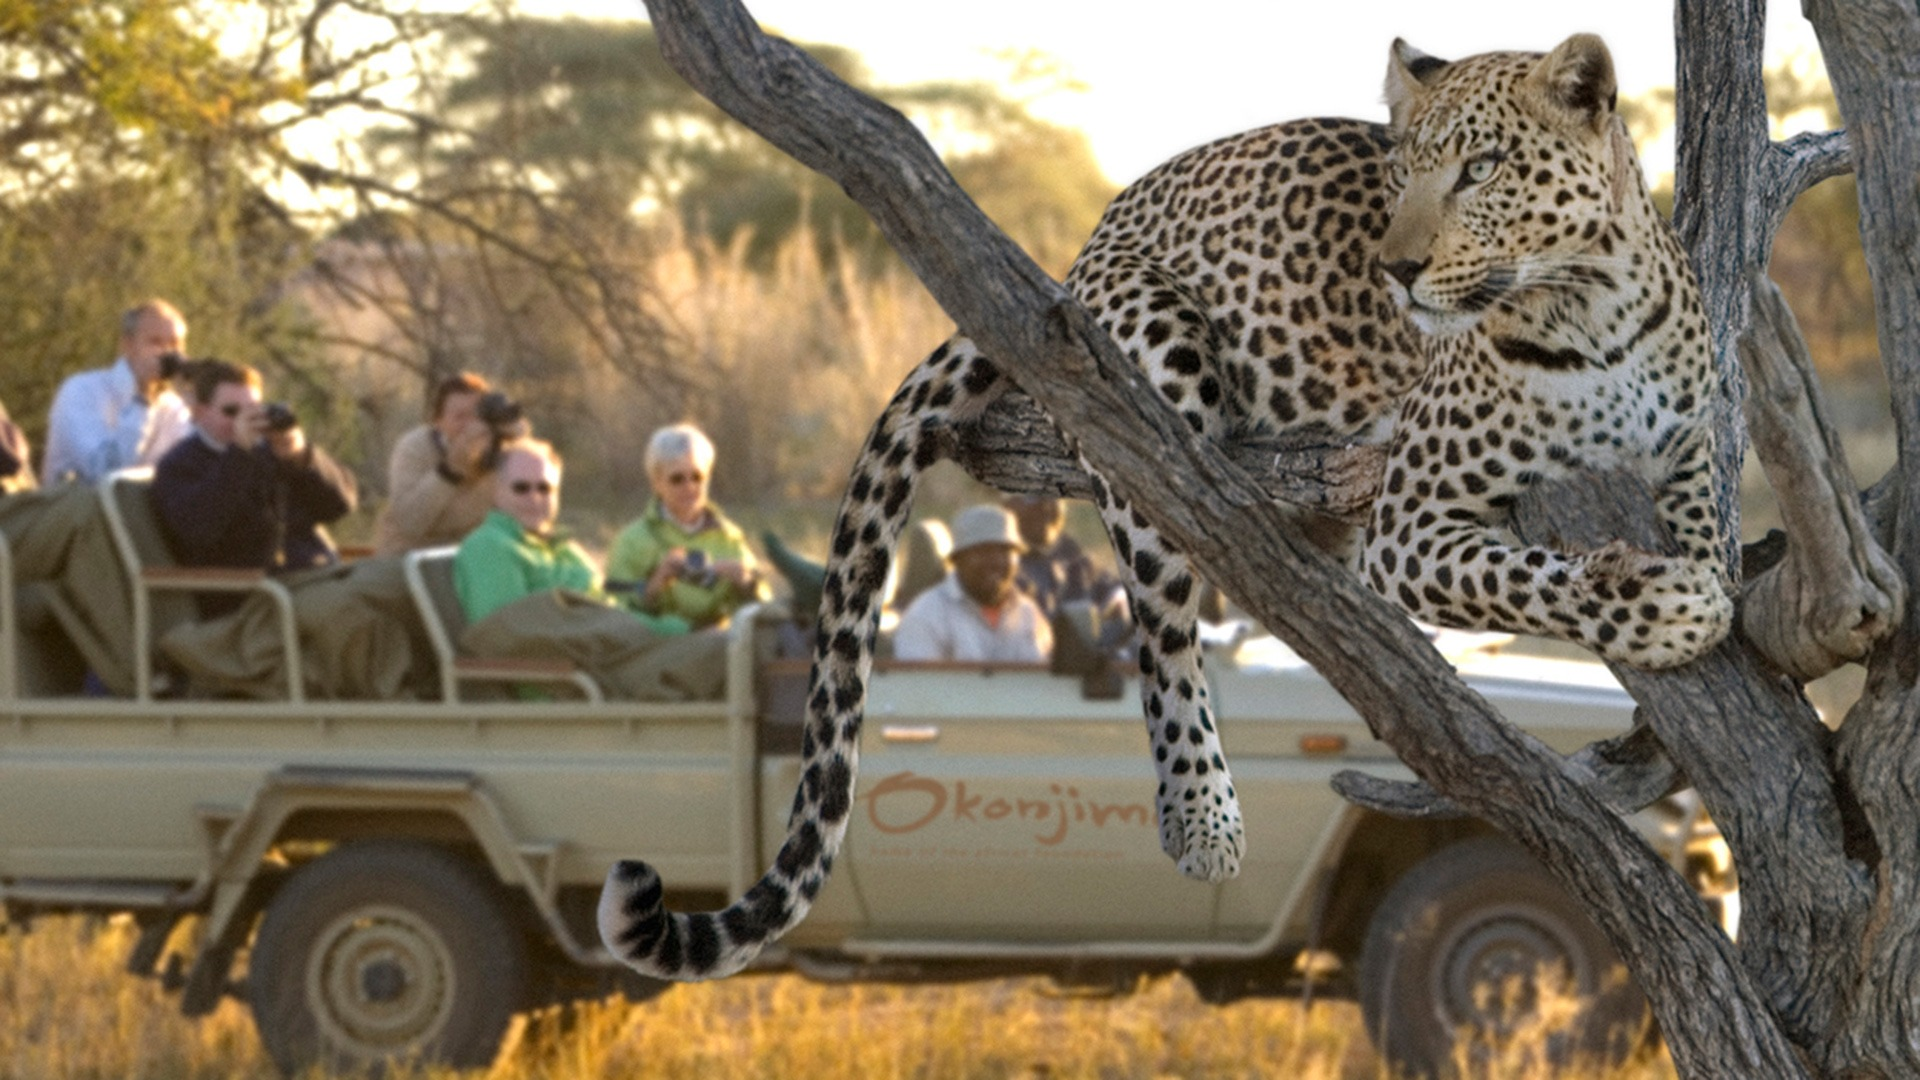 Leopard tracking at Okonjima Nature Reserve, Namibia